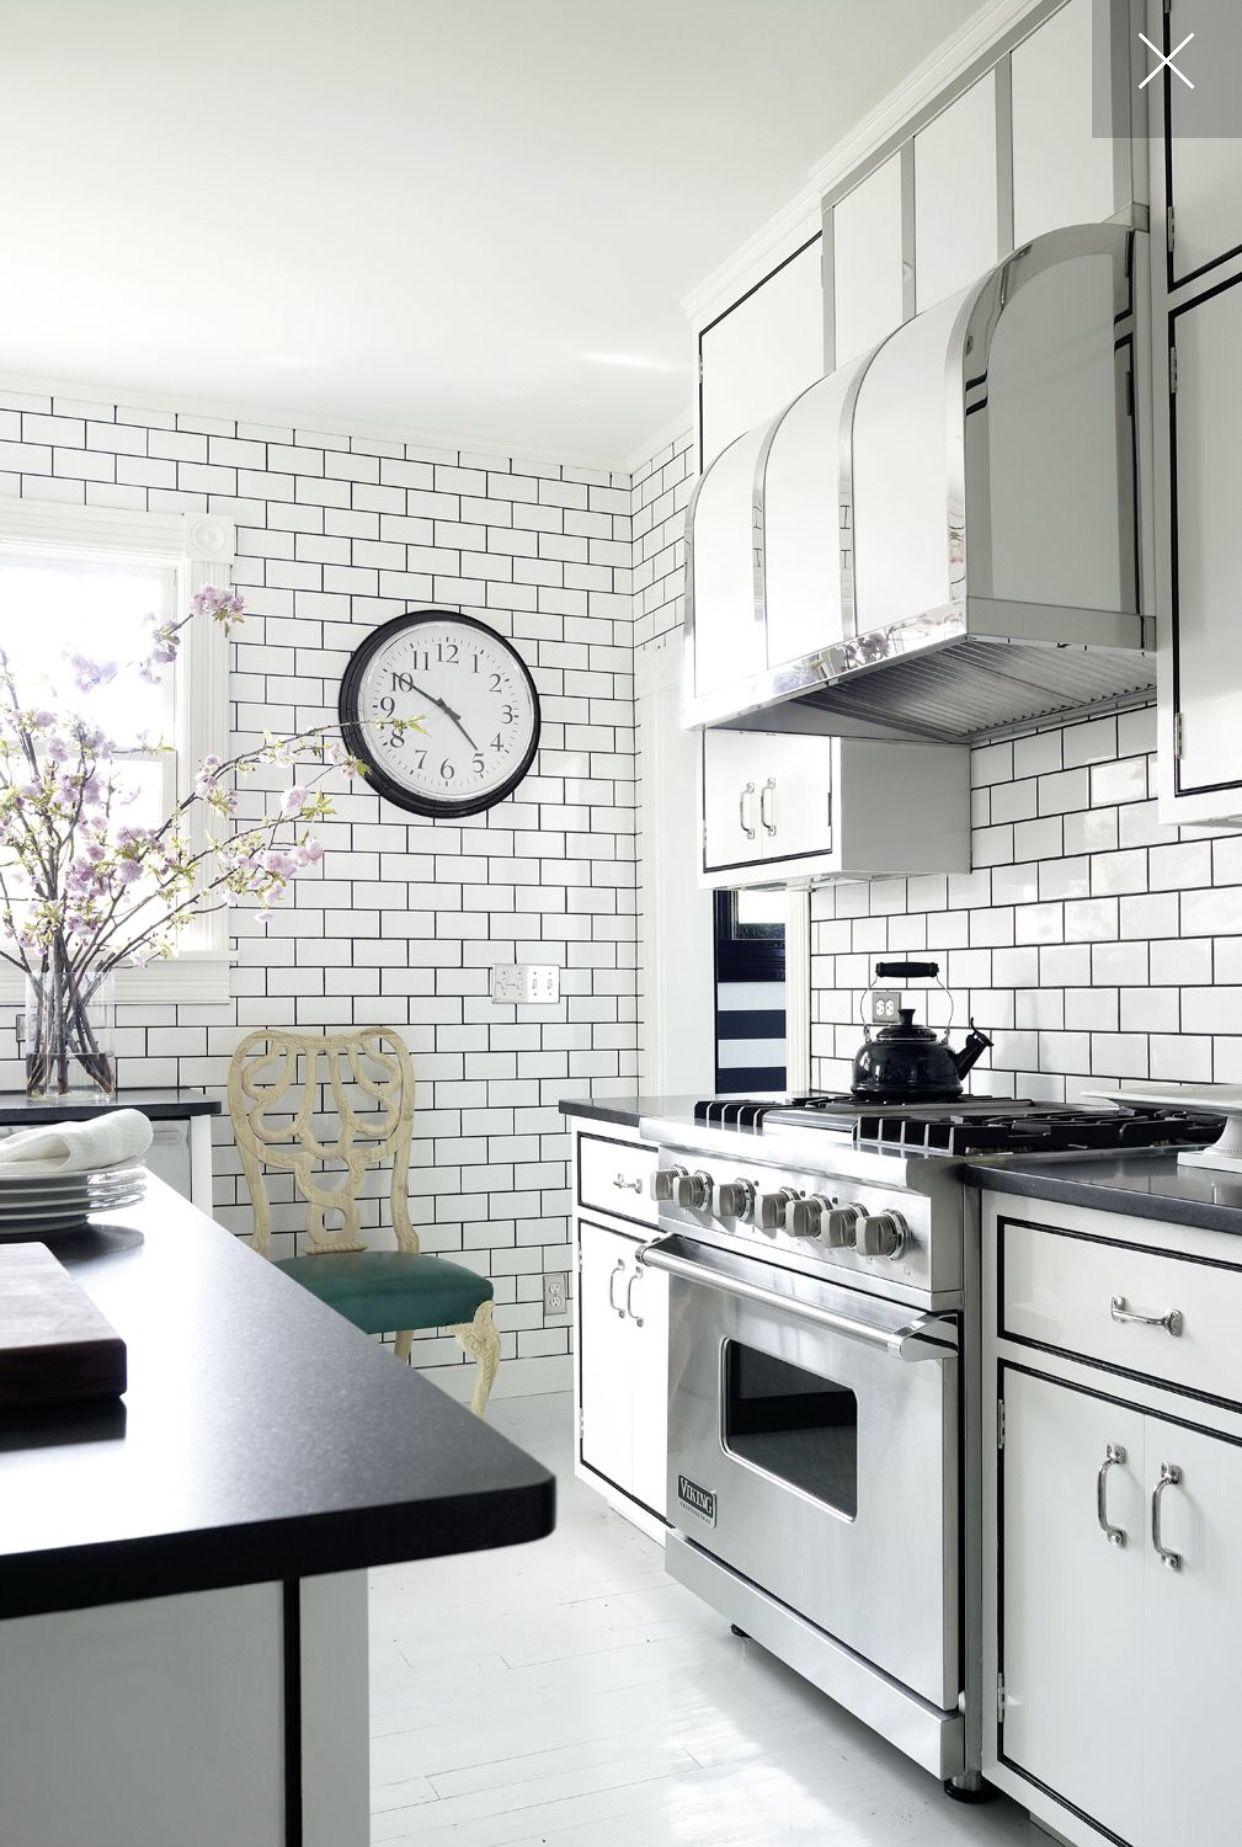 Pin By Happy Groove On Kitchen Designs Kitchen Design Small Kitchen Decor White Subway Tile Kitchen